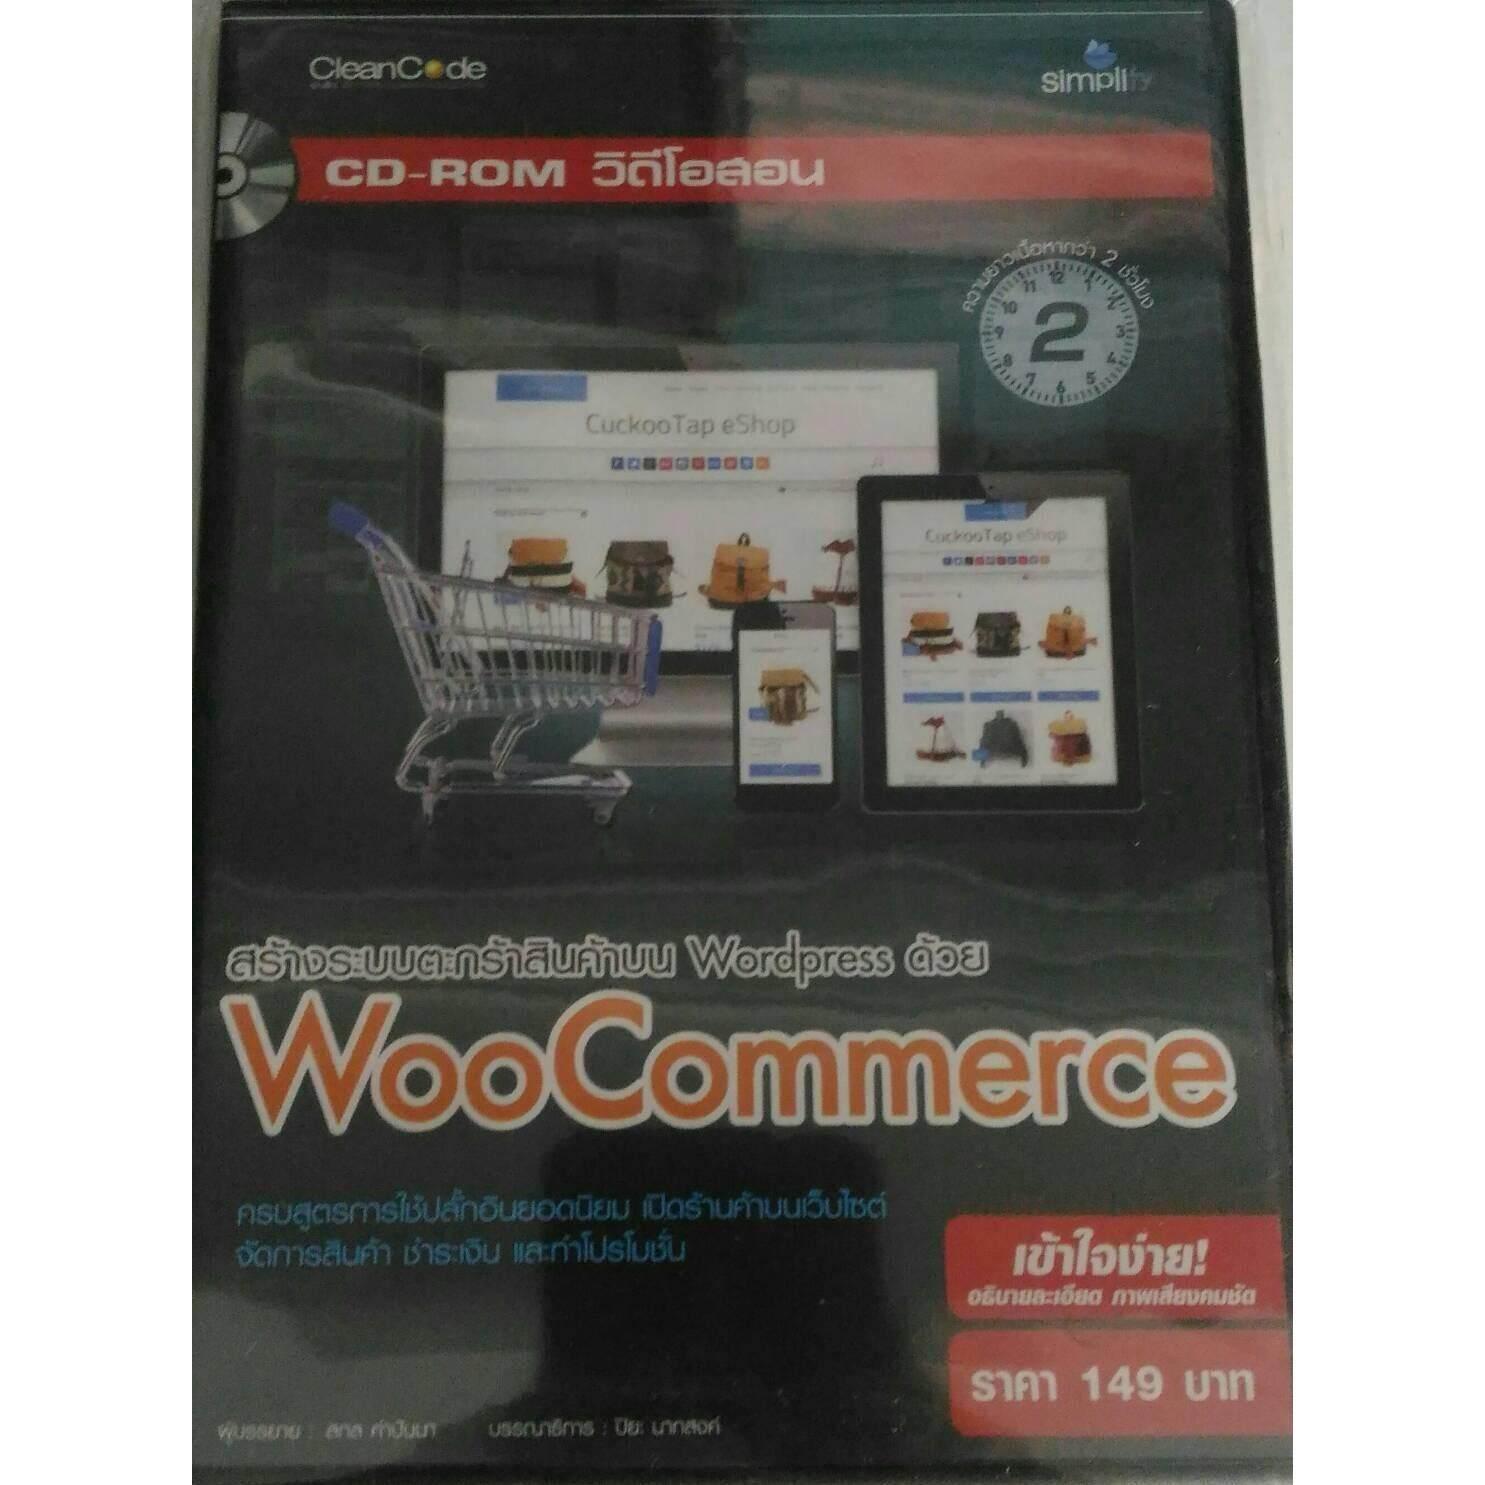 Cd-Rom วิดีโอสอน สร้างระบบตระกร้าสินค้าบน Wordpreess ด้วย Woocommerce.